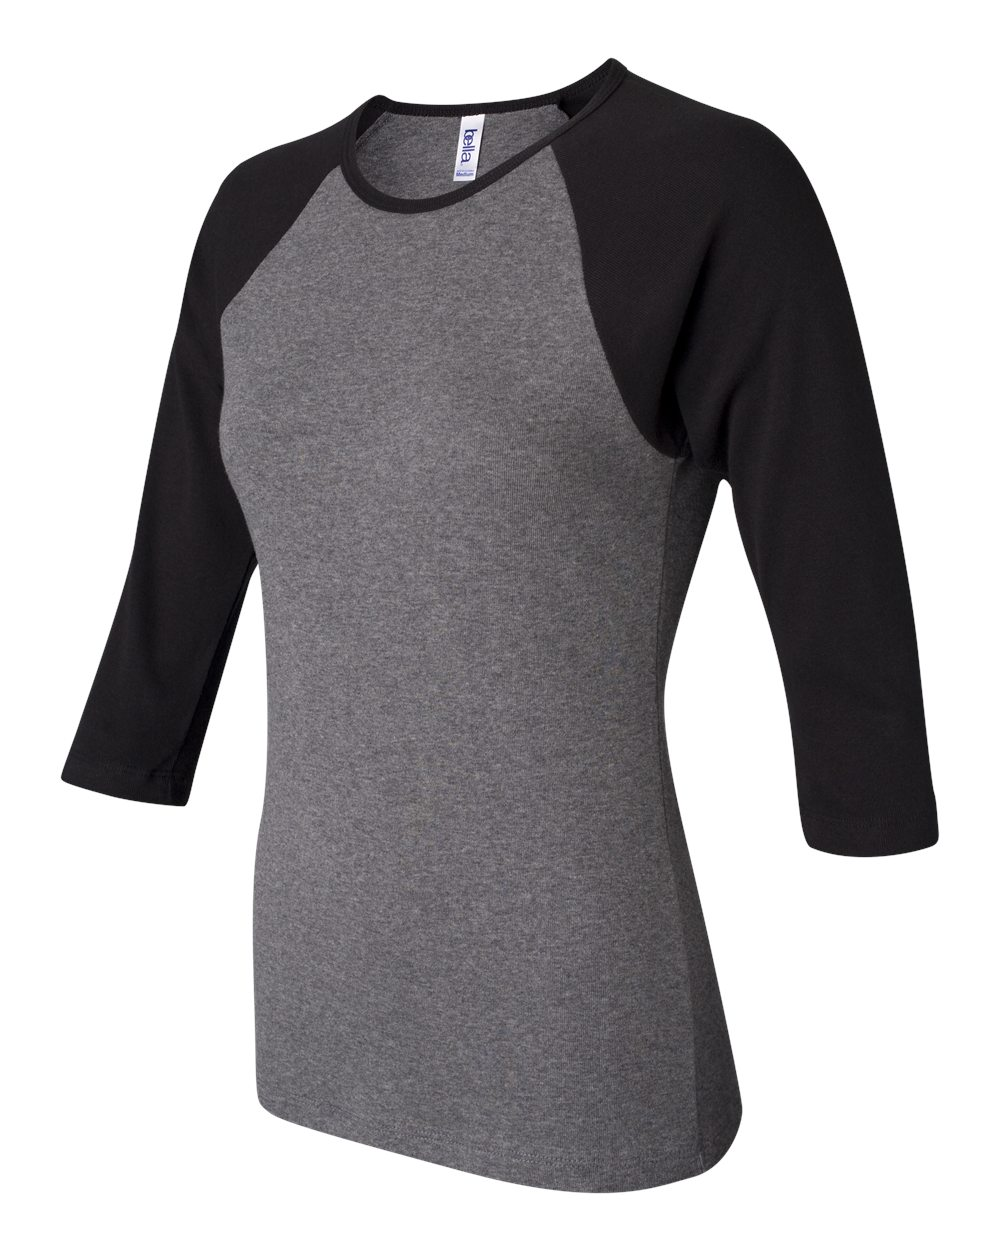 Bella-Canvas-Womens-Stretch-Rib-3-4-Sleeve-Contrast-Raglan-T-Shirt-B2000 thumbnail 10